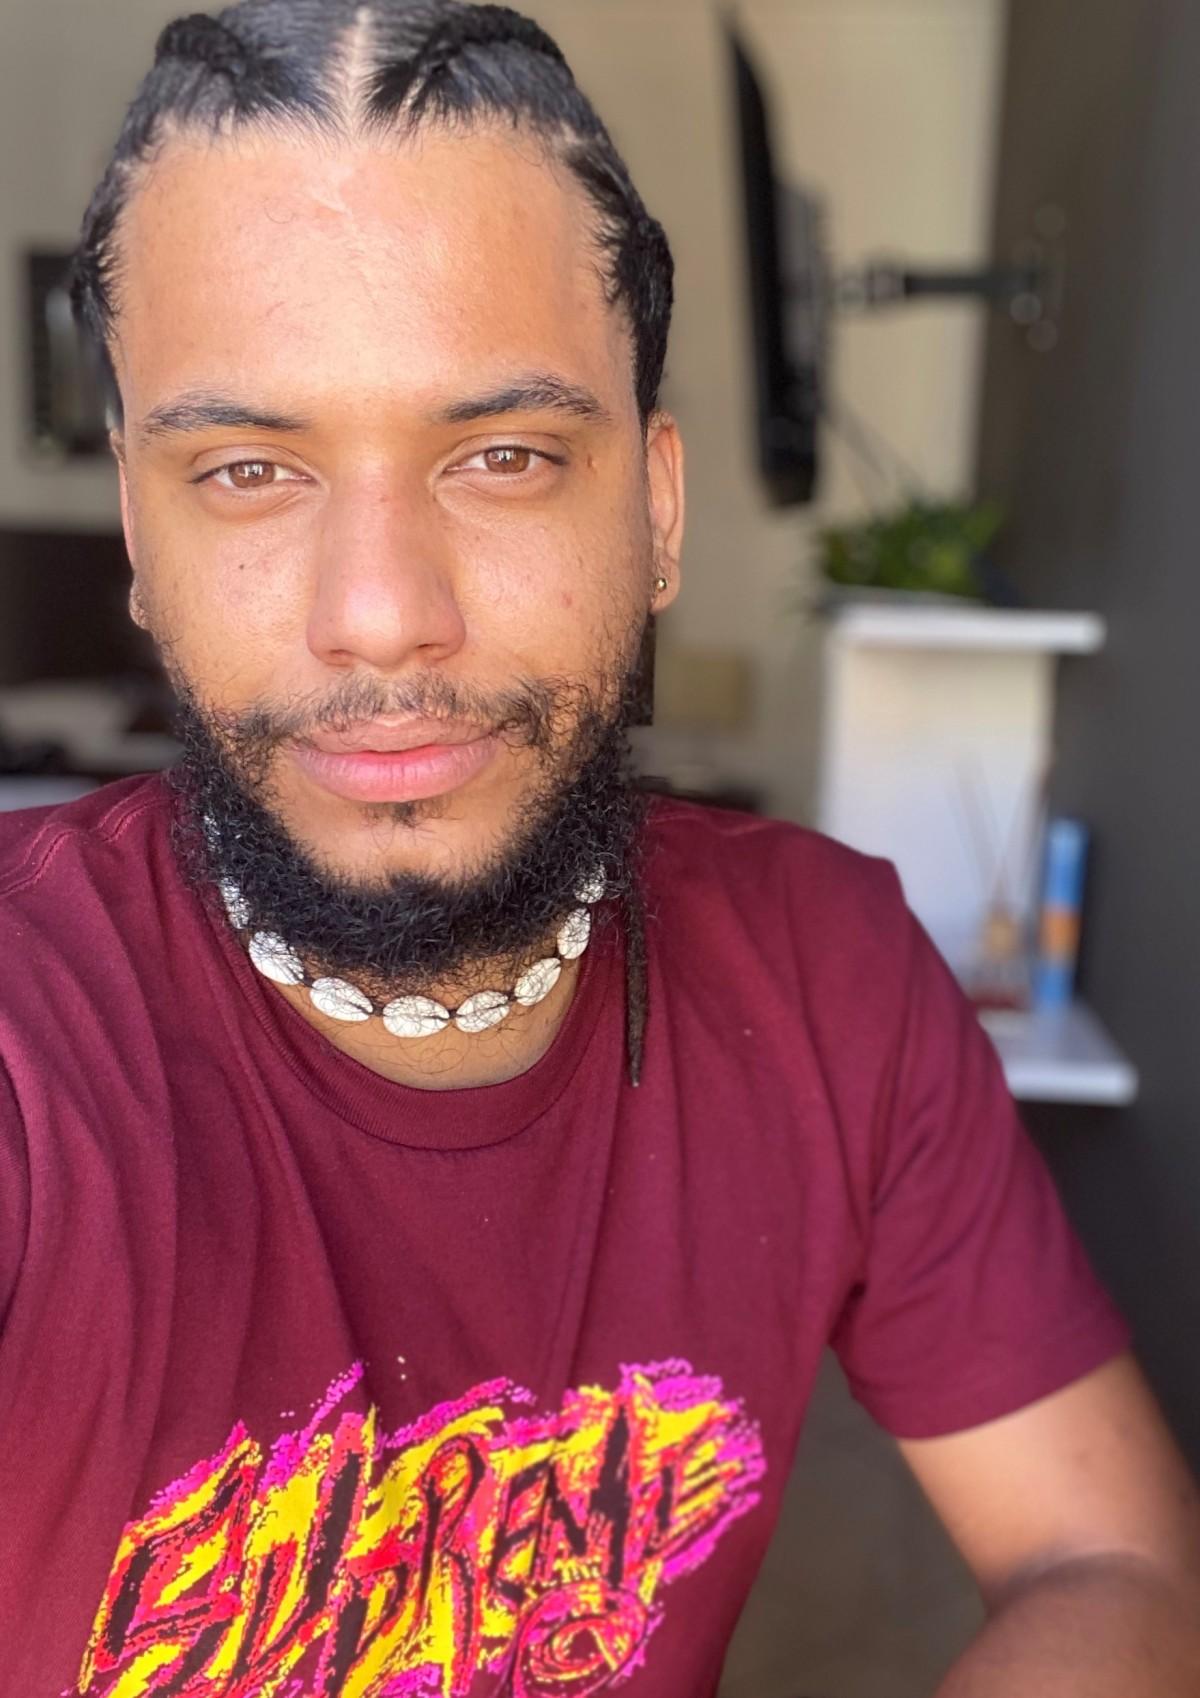 Touro TESOL/Bilingual teacher candidate Elias Y. Taveras reflects on AffirmingDiversity